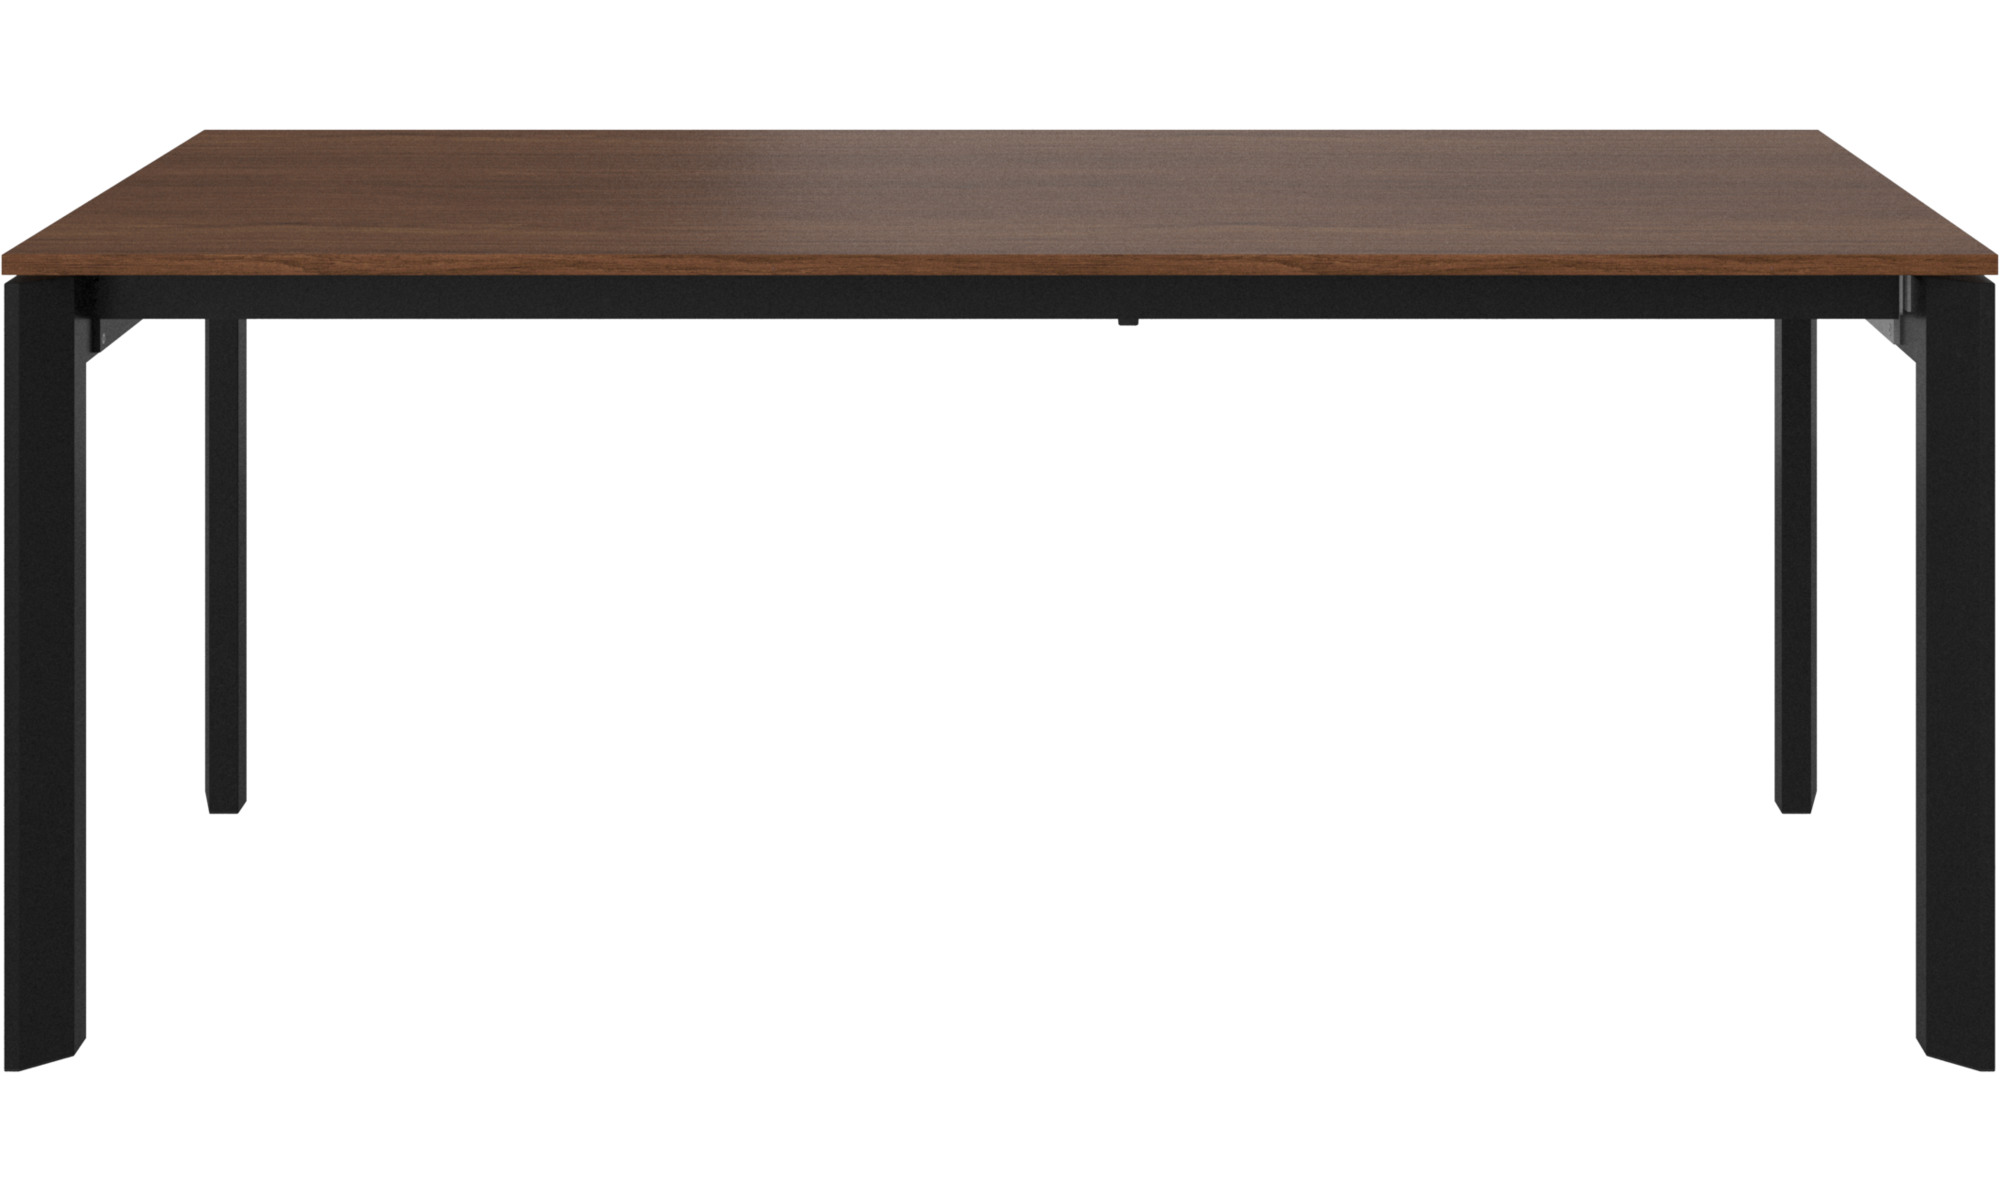 eetkamertafel lyon tafel met extra tafelblad boconcept. Black Bedroom Furniture Sets. Home Design Ideas